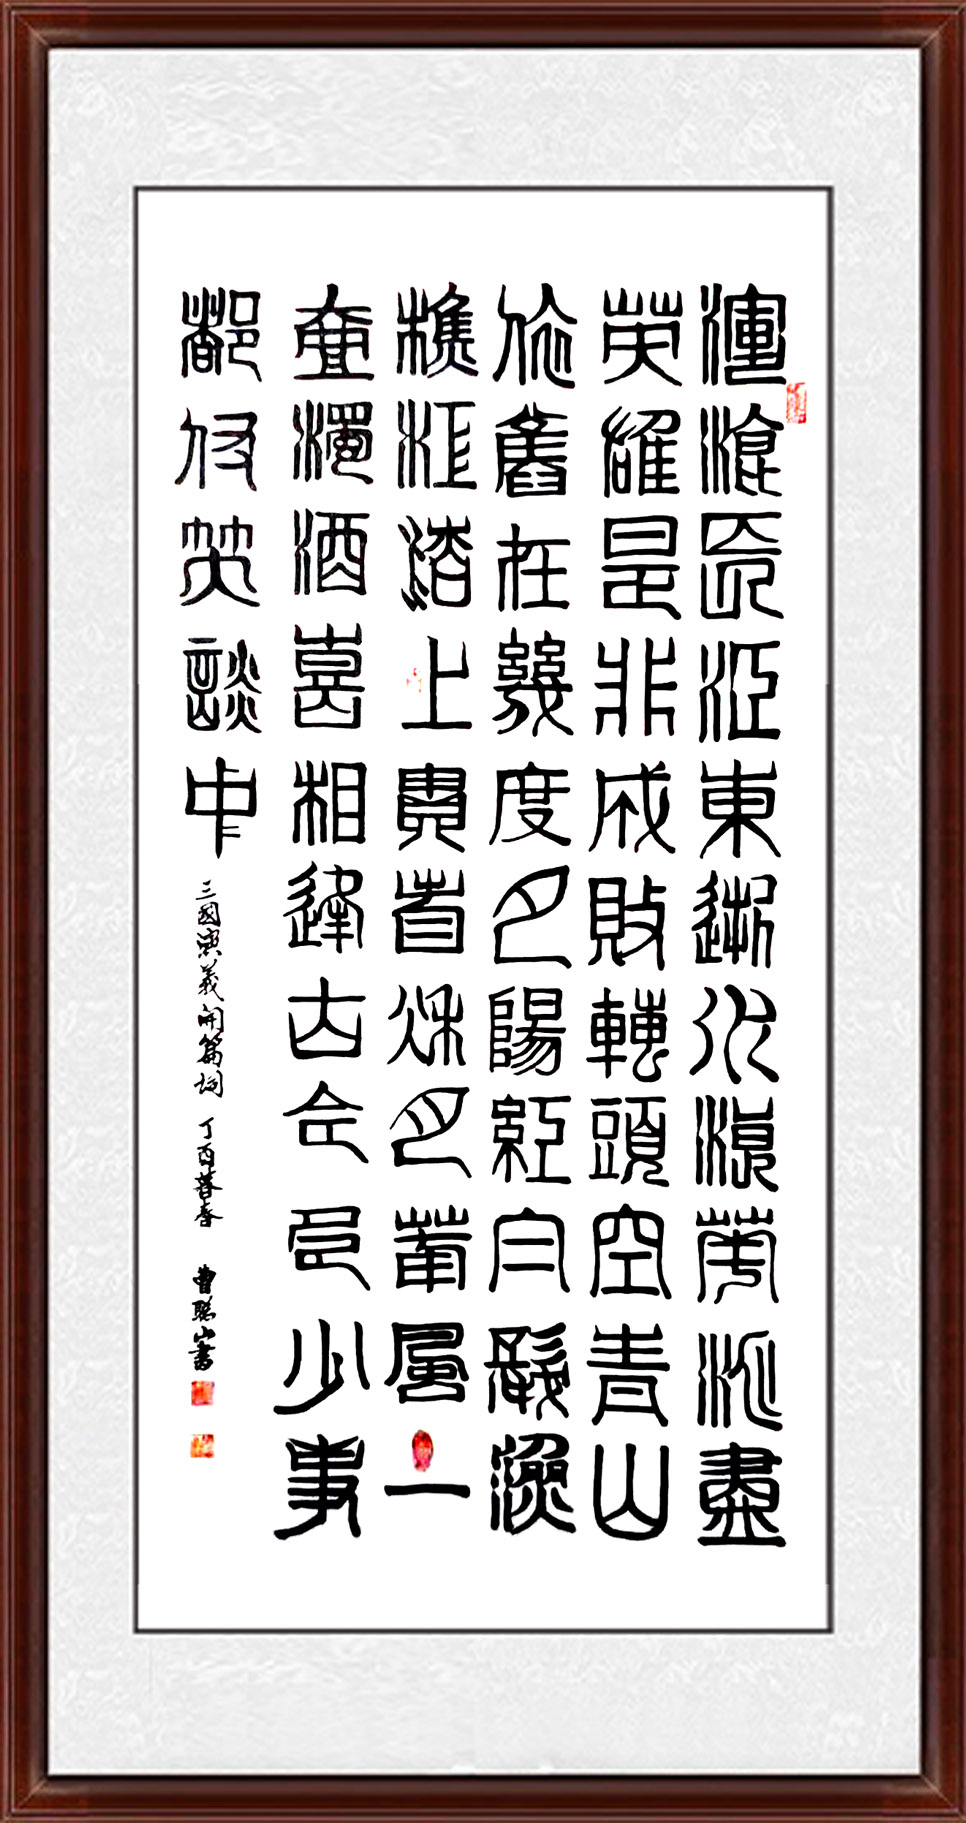 C:\Users\Administrator\Desktop\王明超-曹聪山-欧洲网\18.jpg